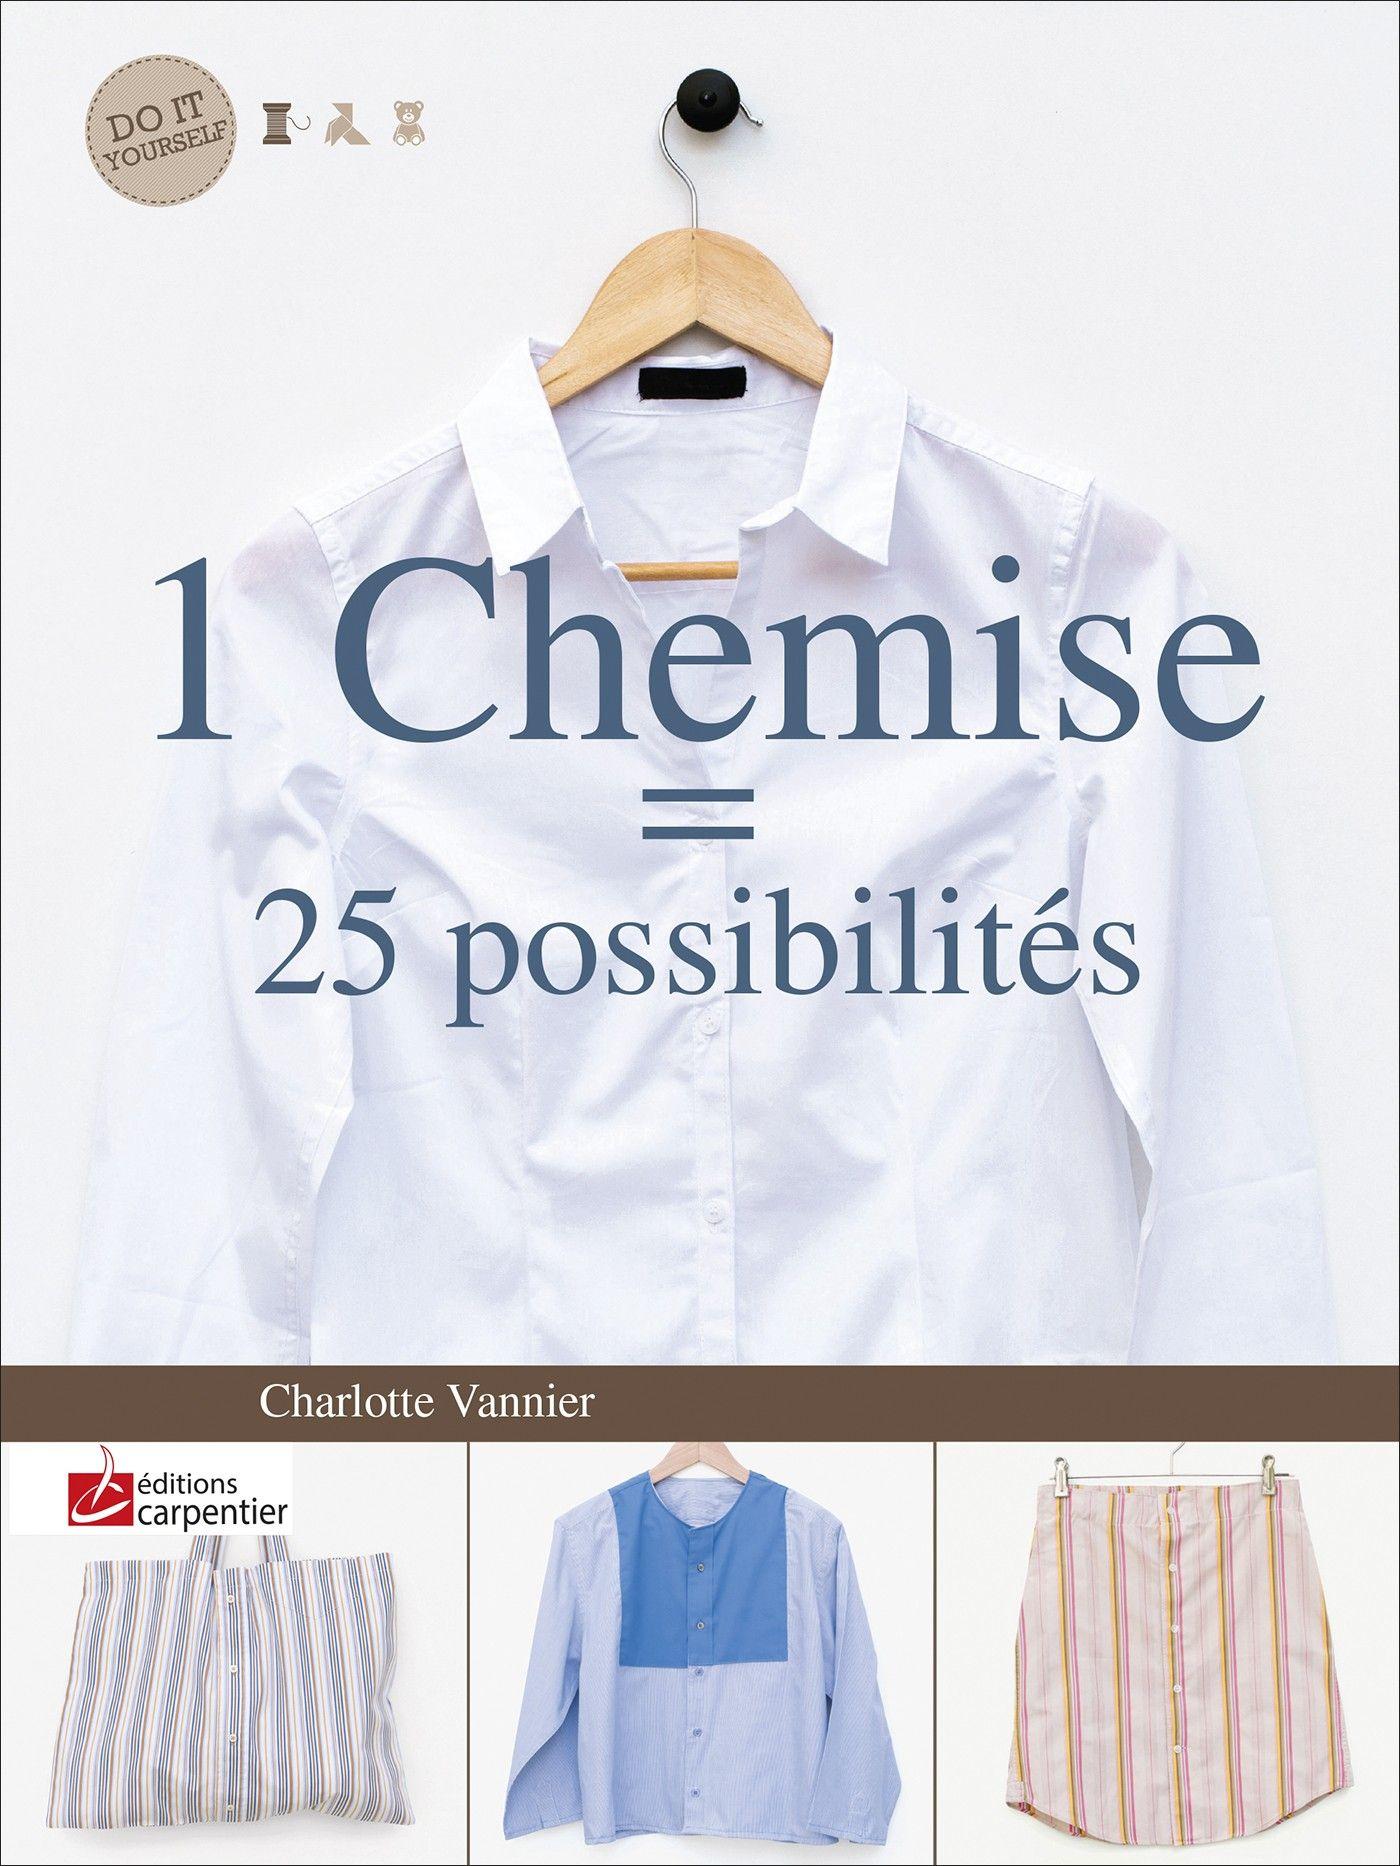 1 Chemise 25 Possibilites Editions Carpentier Chemises Recyclees Recyclage Vetement Vieux Vetements